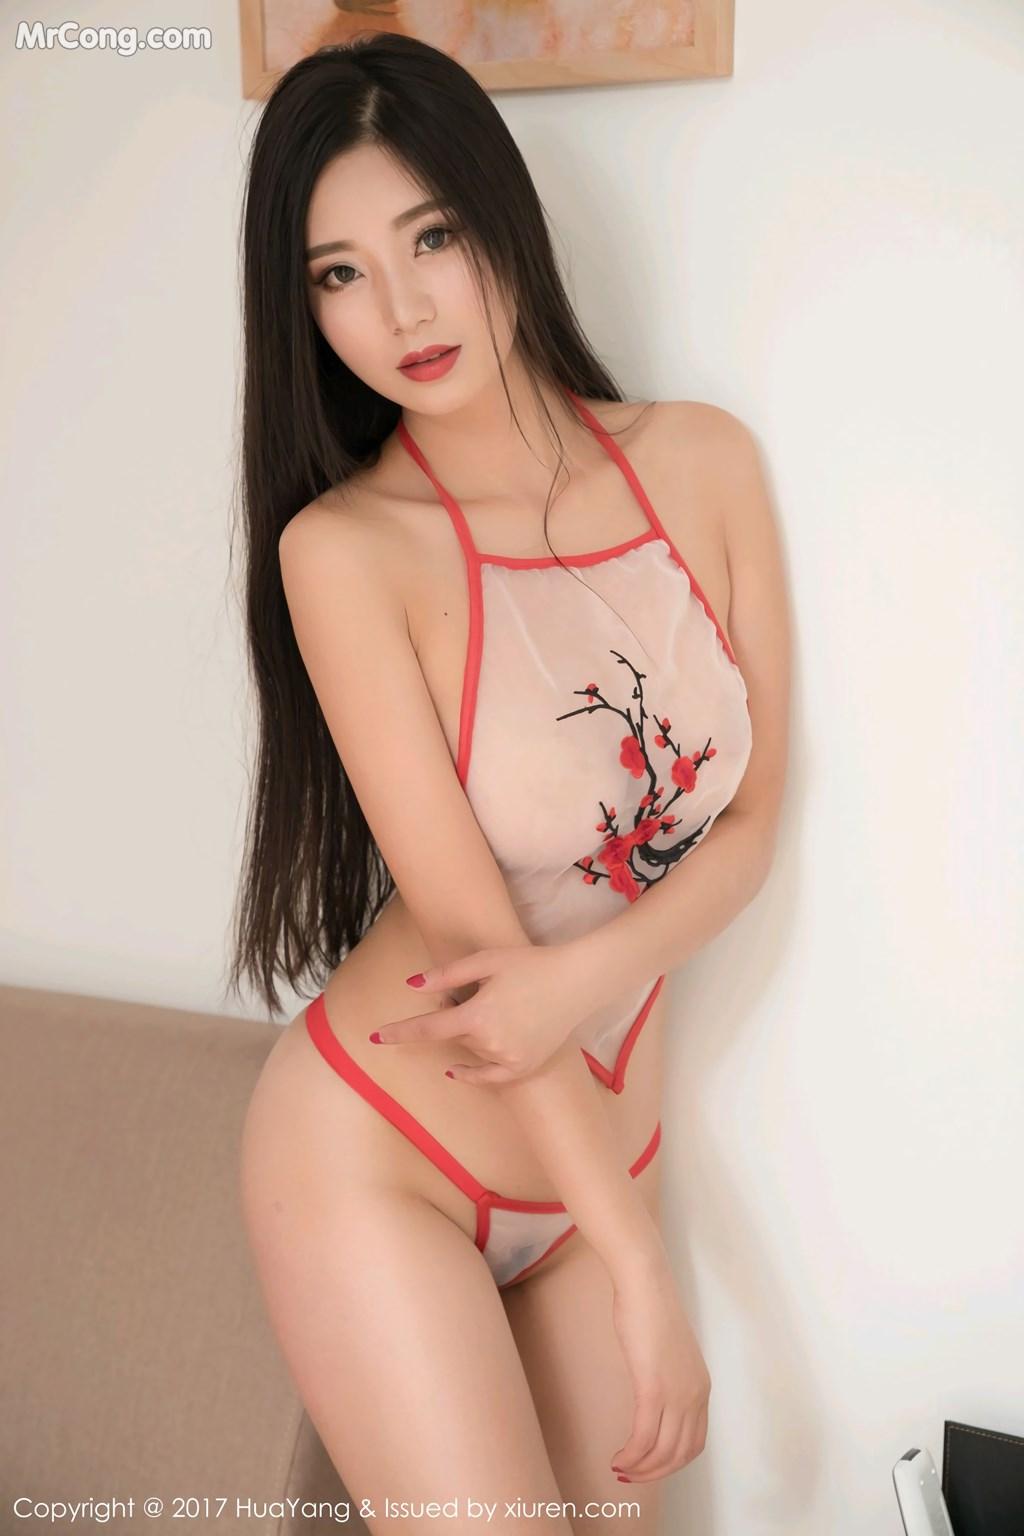 Image HuaYang-2017-11-10-Vol.015-KiKi-MrCong.com-014 in post HuaYang 2017-11-10 Vol.015: Người mẫu 宋-KiKi (45 ảnh)